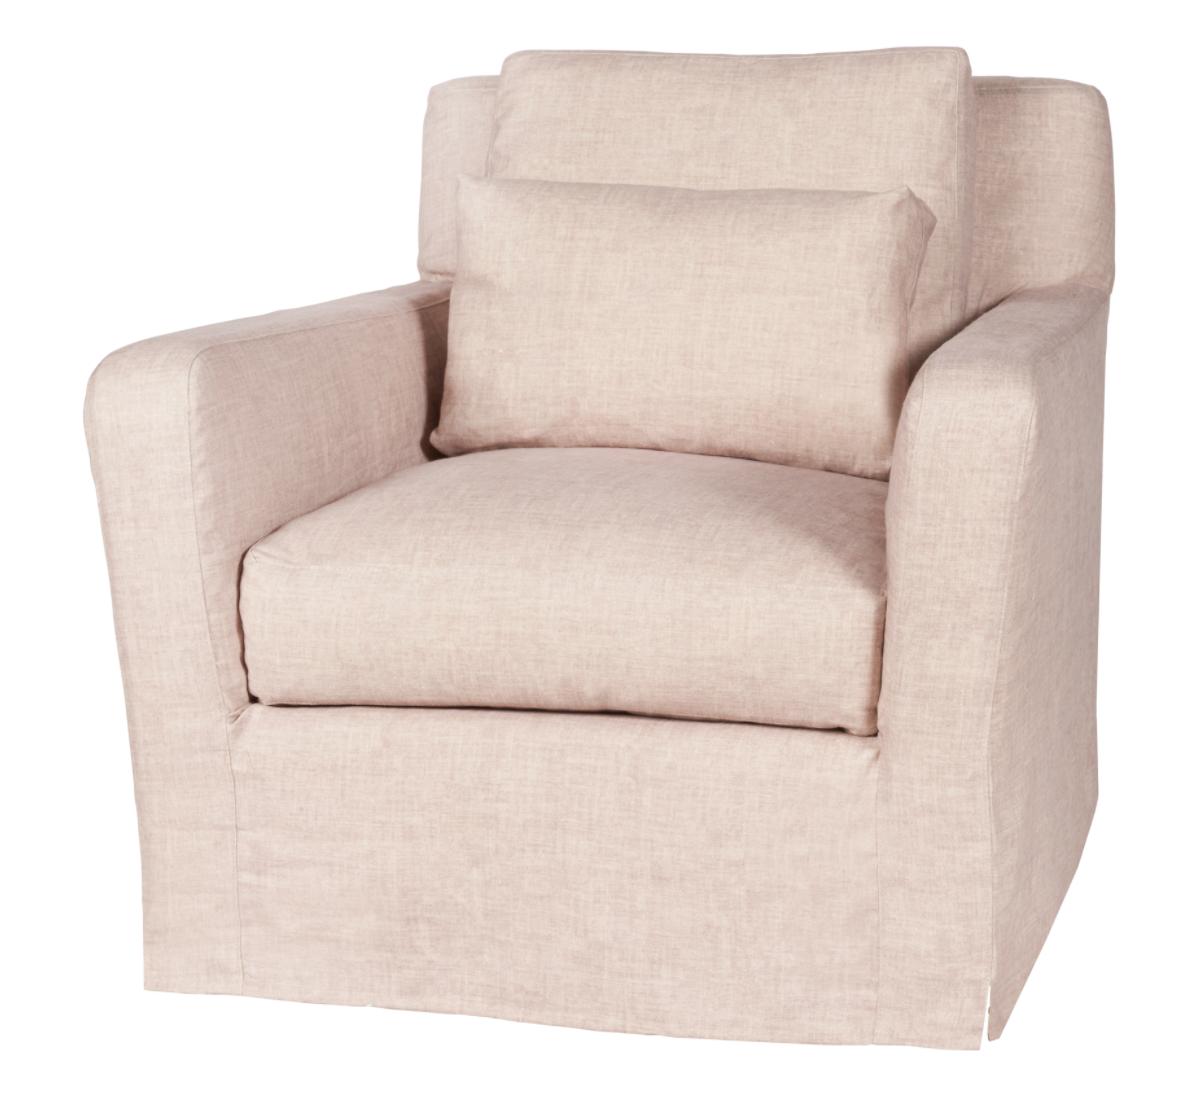 Malibu Chair - Fatima Gunmetal